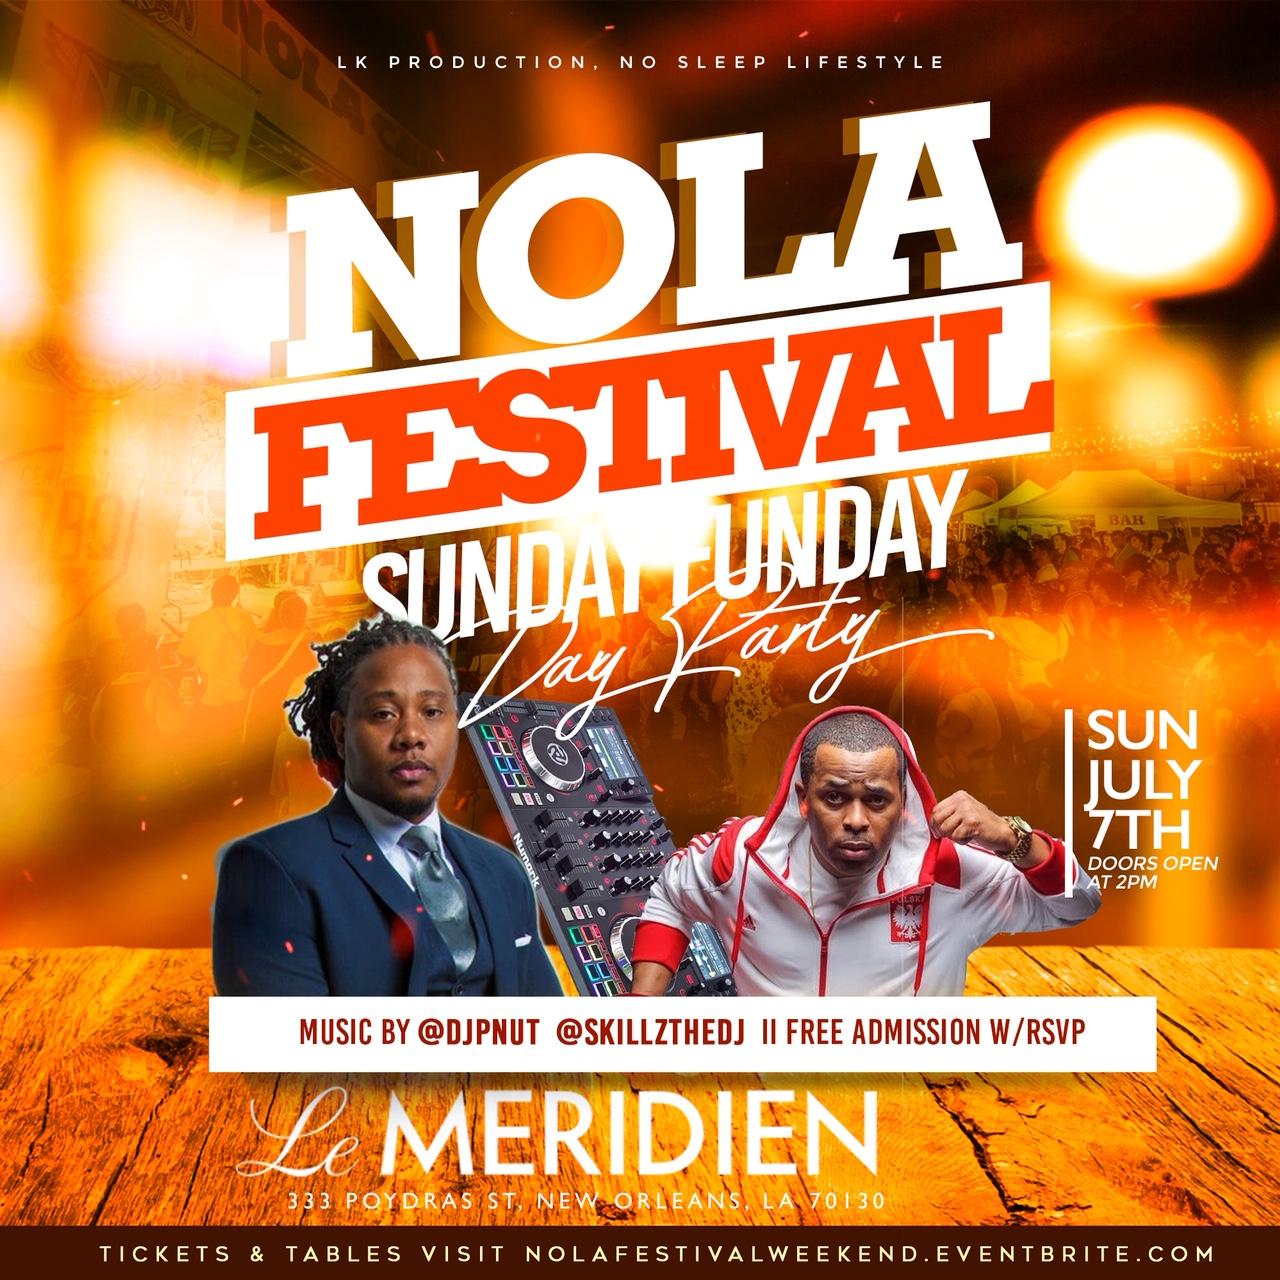 NOLA Festival Sunday Day Party